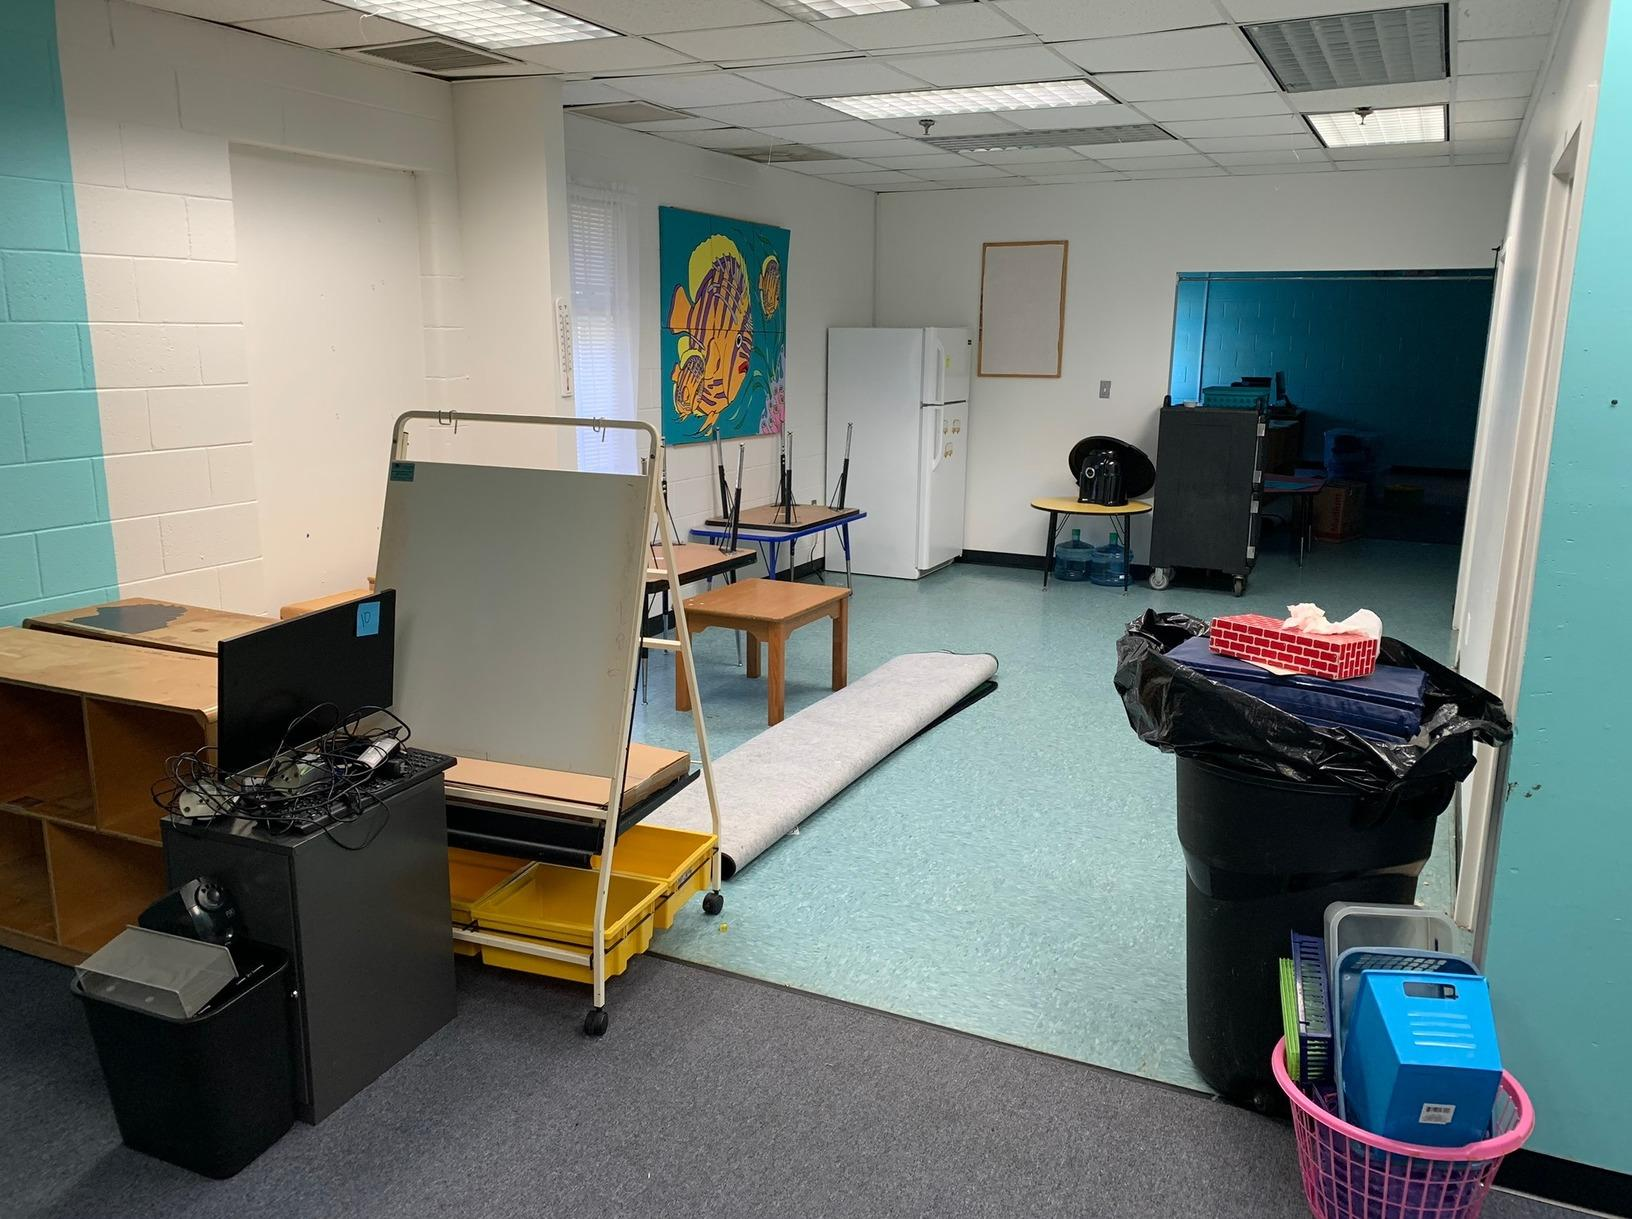 Preschool Furniture Removal in Williamsburg, VA - Before Photo